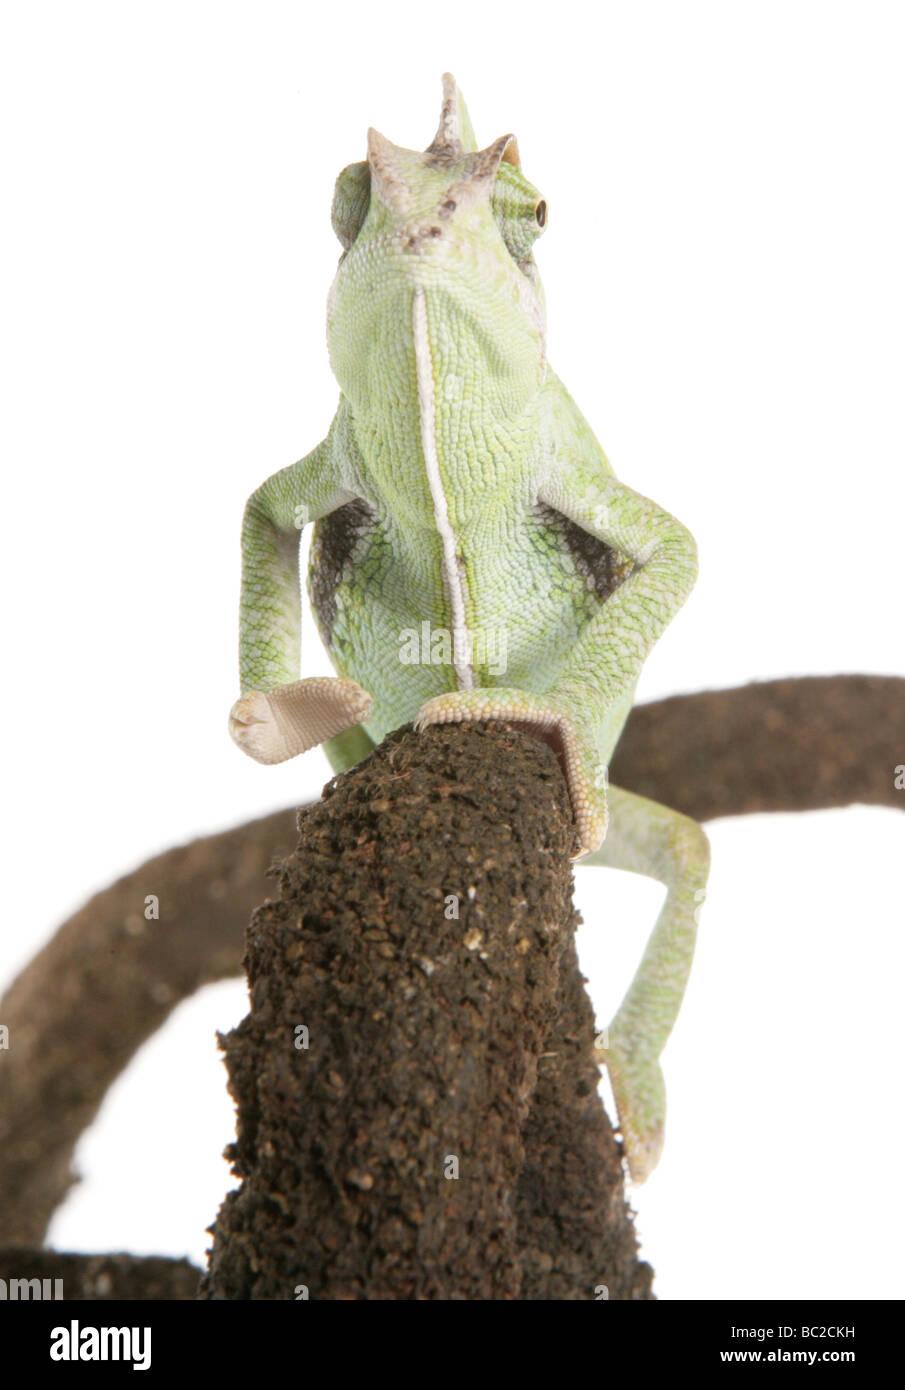 Yemen Chameleon aka veiled chameleon Chamaeleo calyptratus portrait in a studio - Stock Image